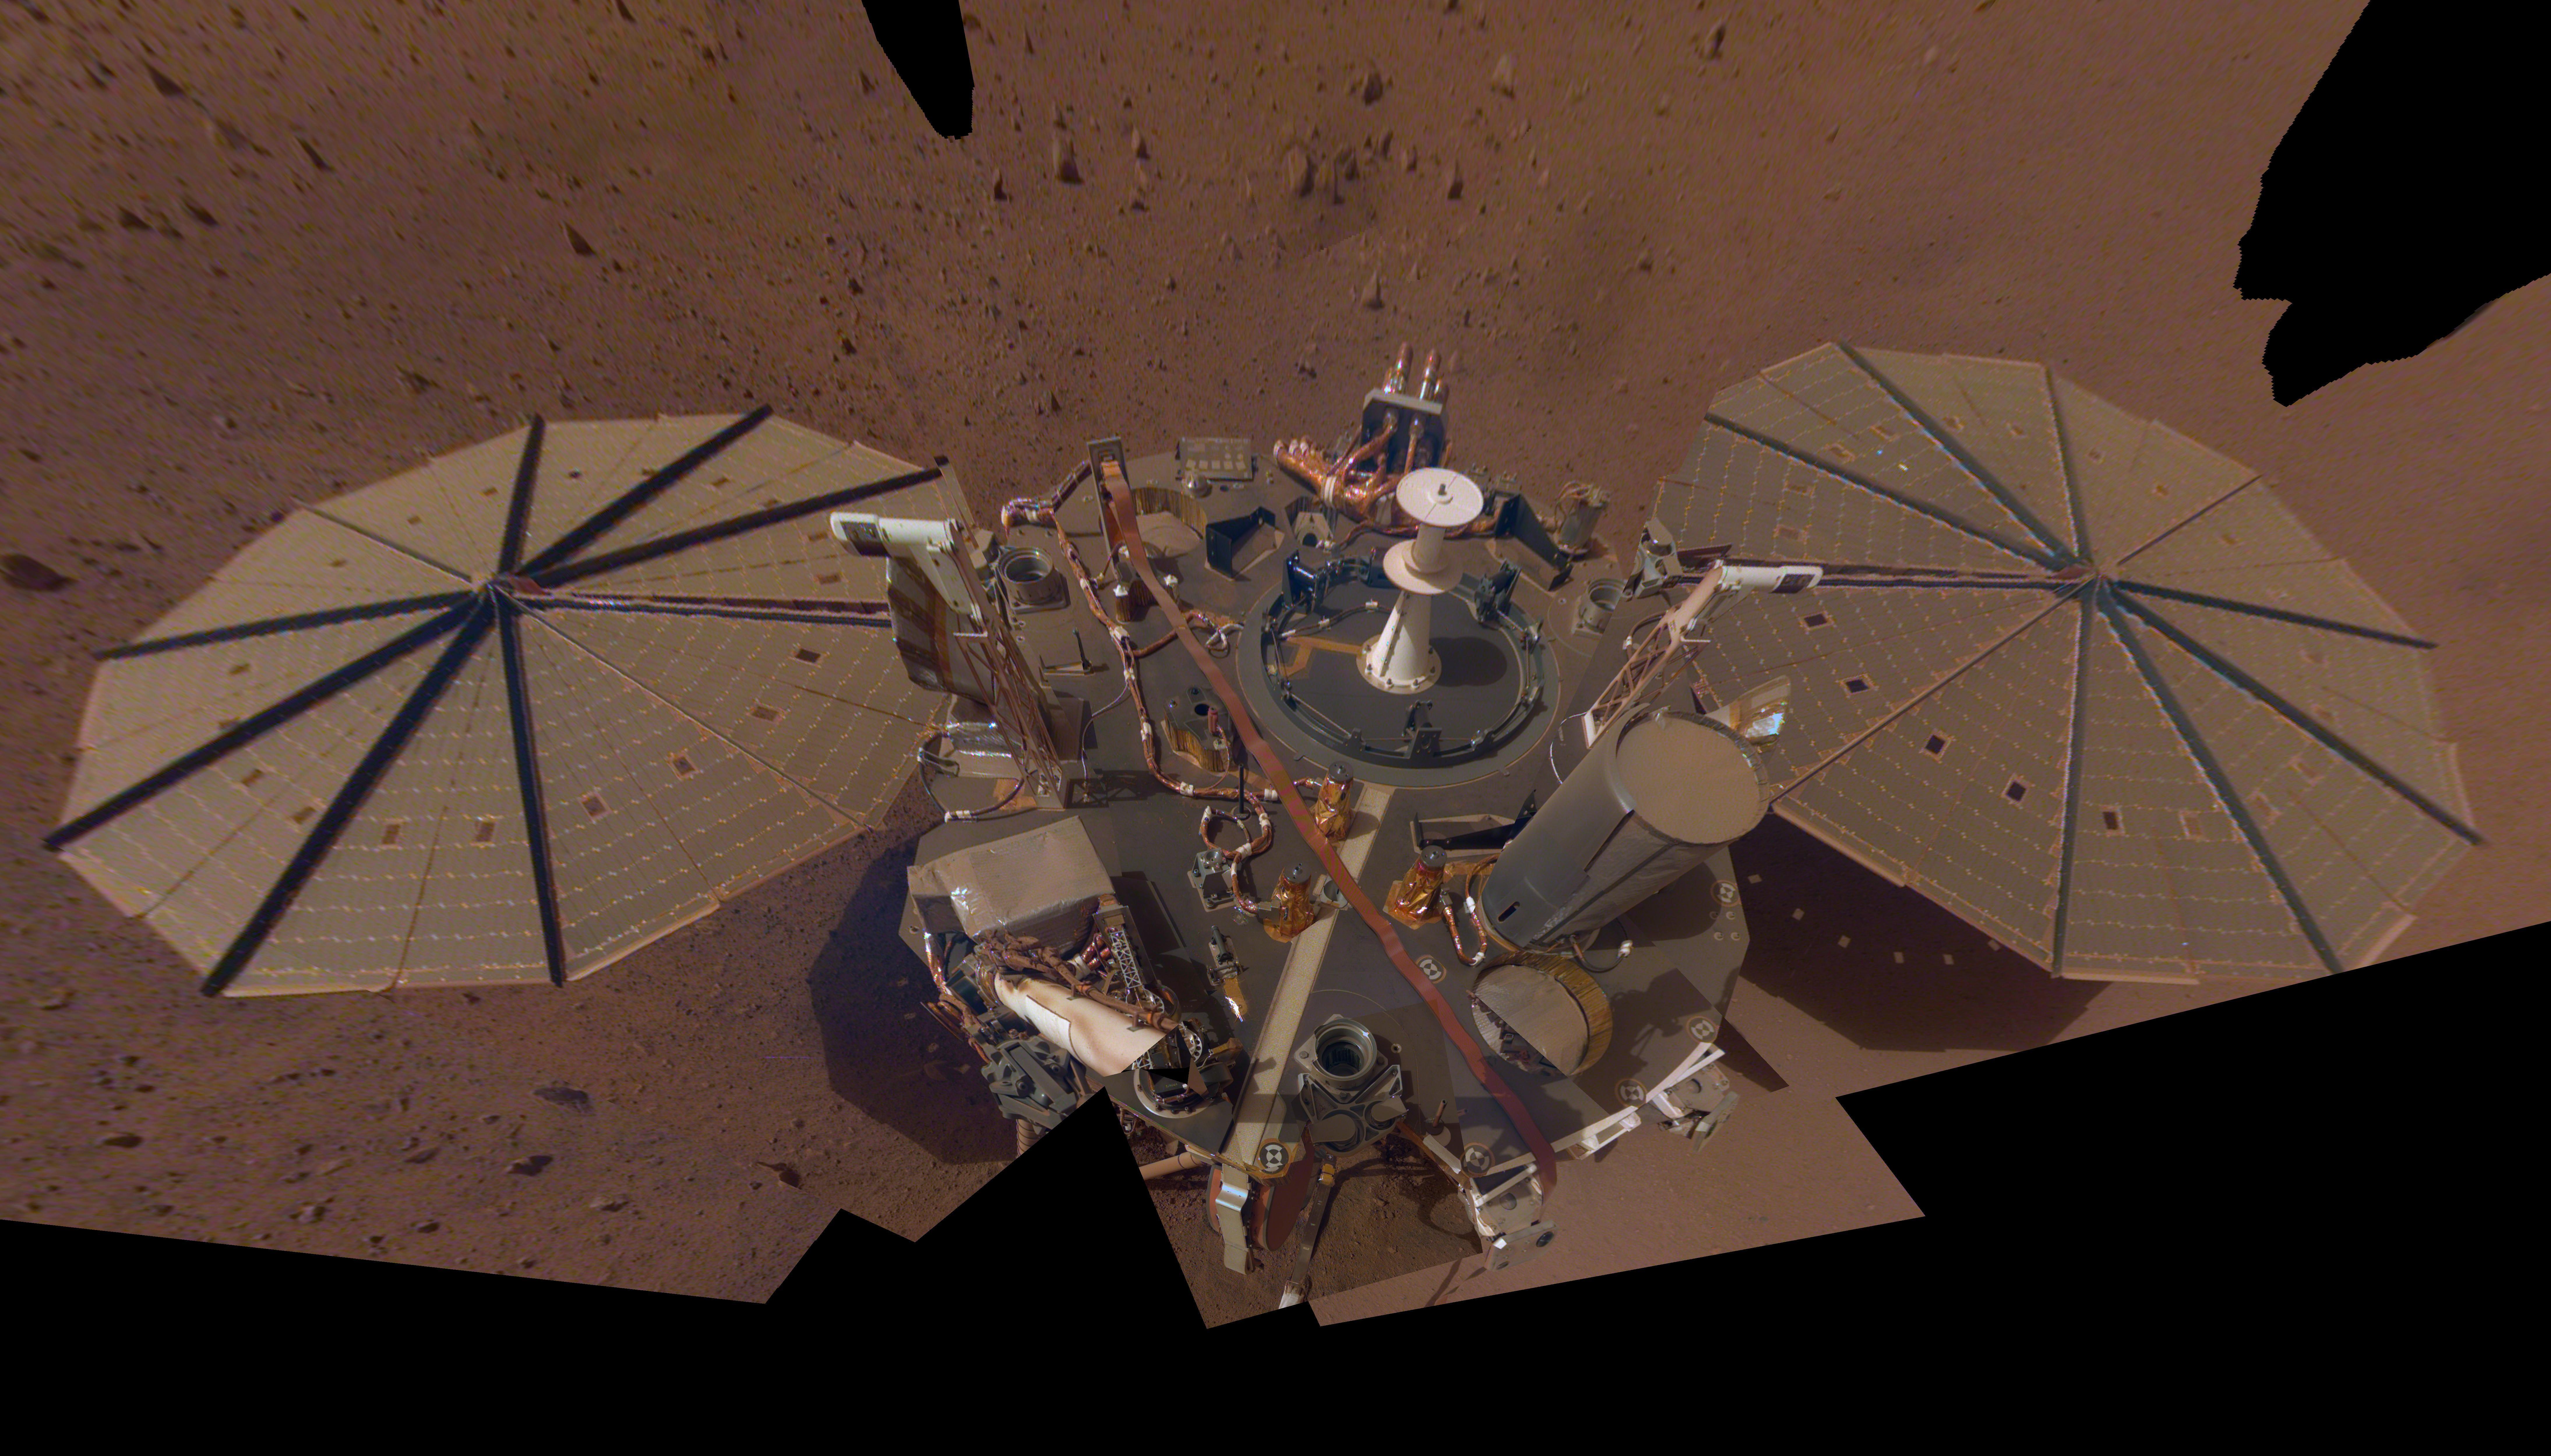 Как устроен Марс внутри?